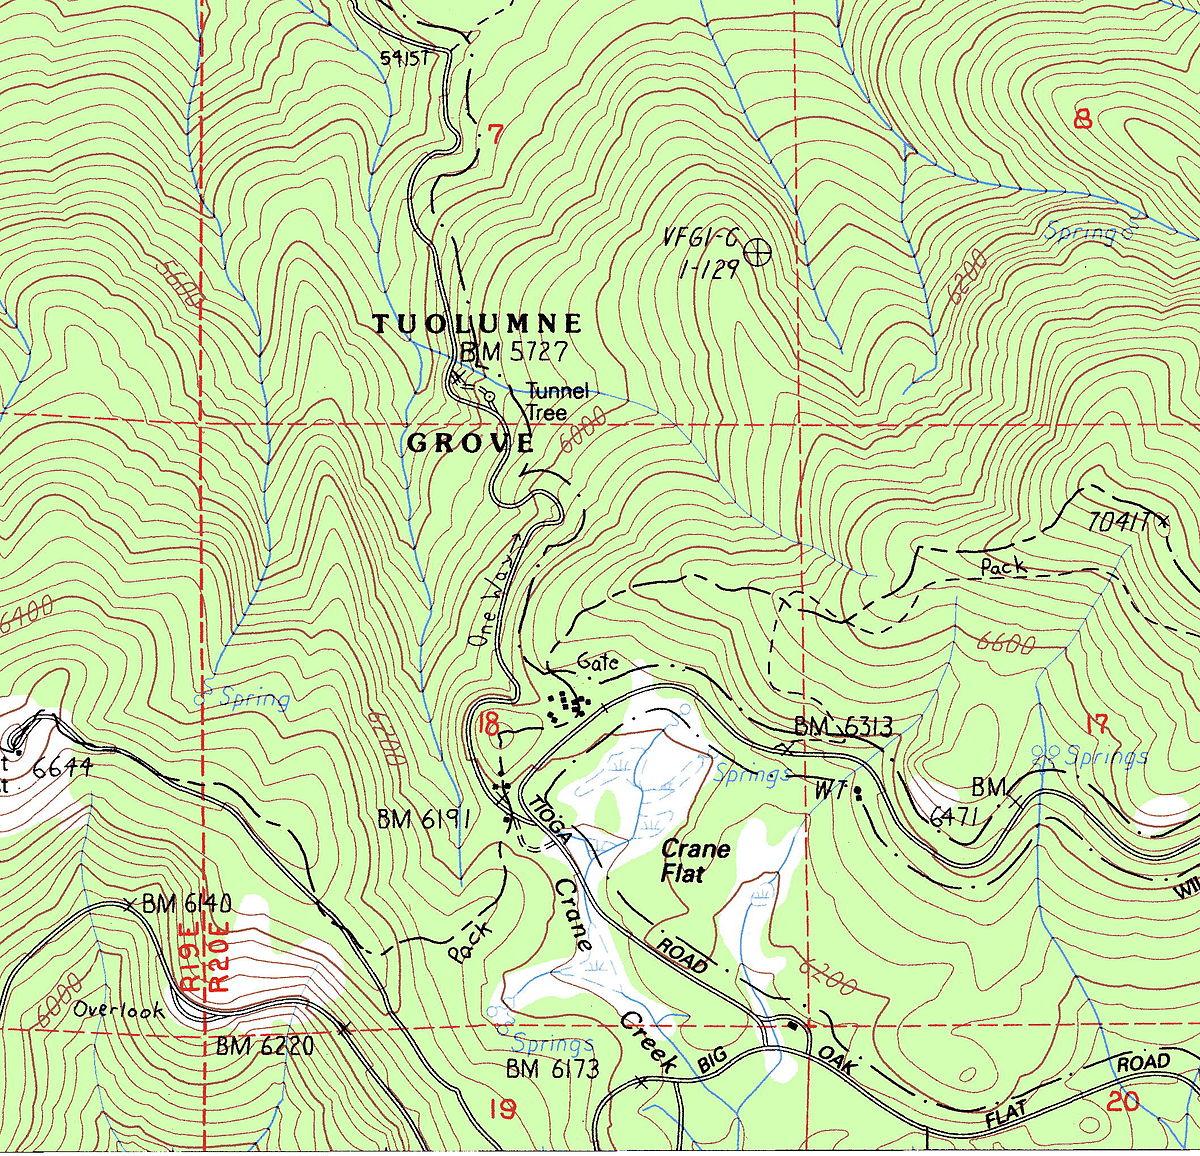 States Visited Map >> Tuolumne Grove - Wikipedia